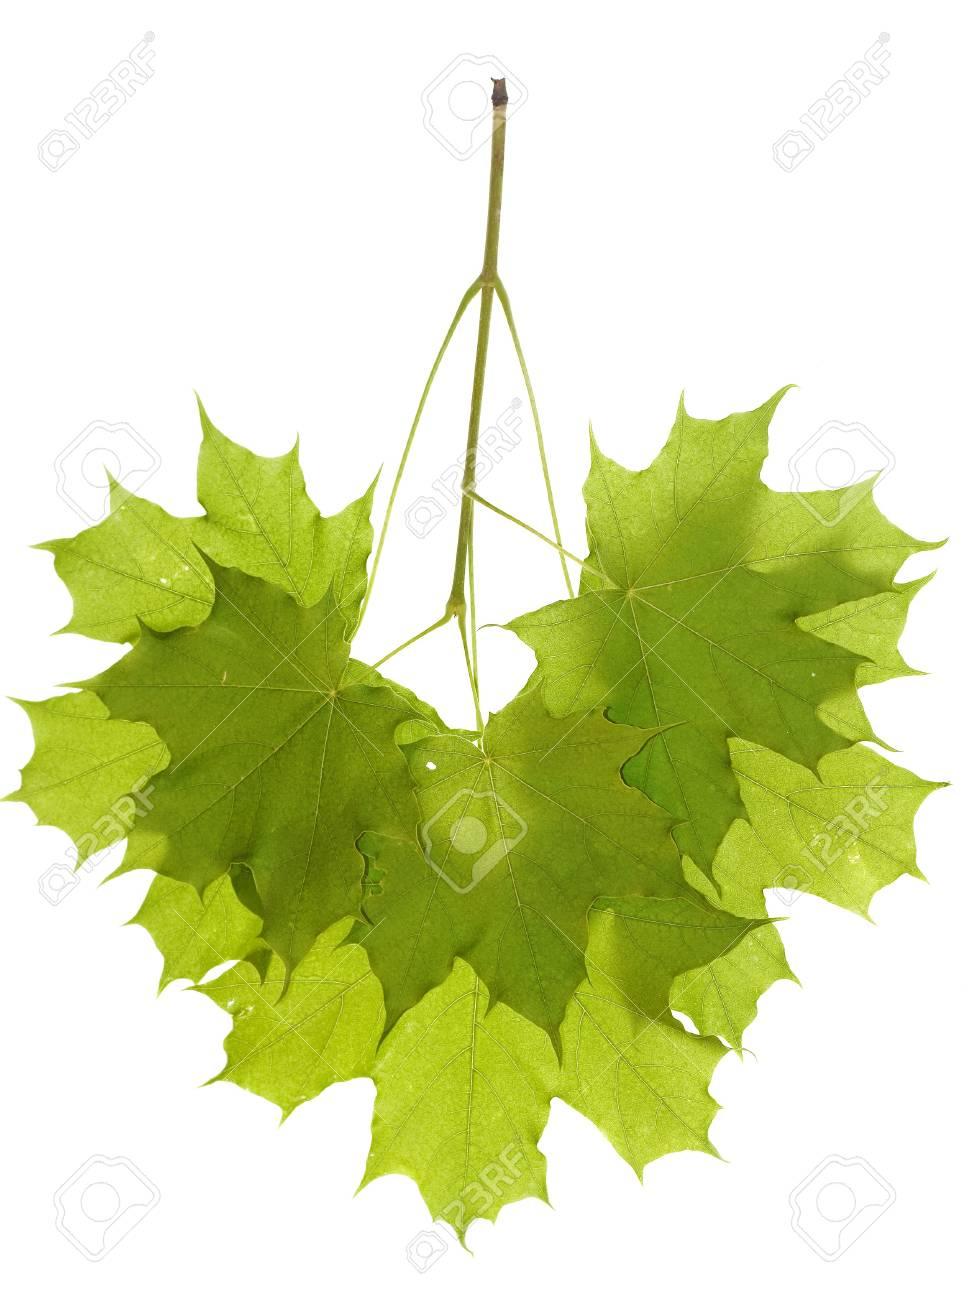 Leaves isolated on white background Stock Photo - 4409880